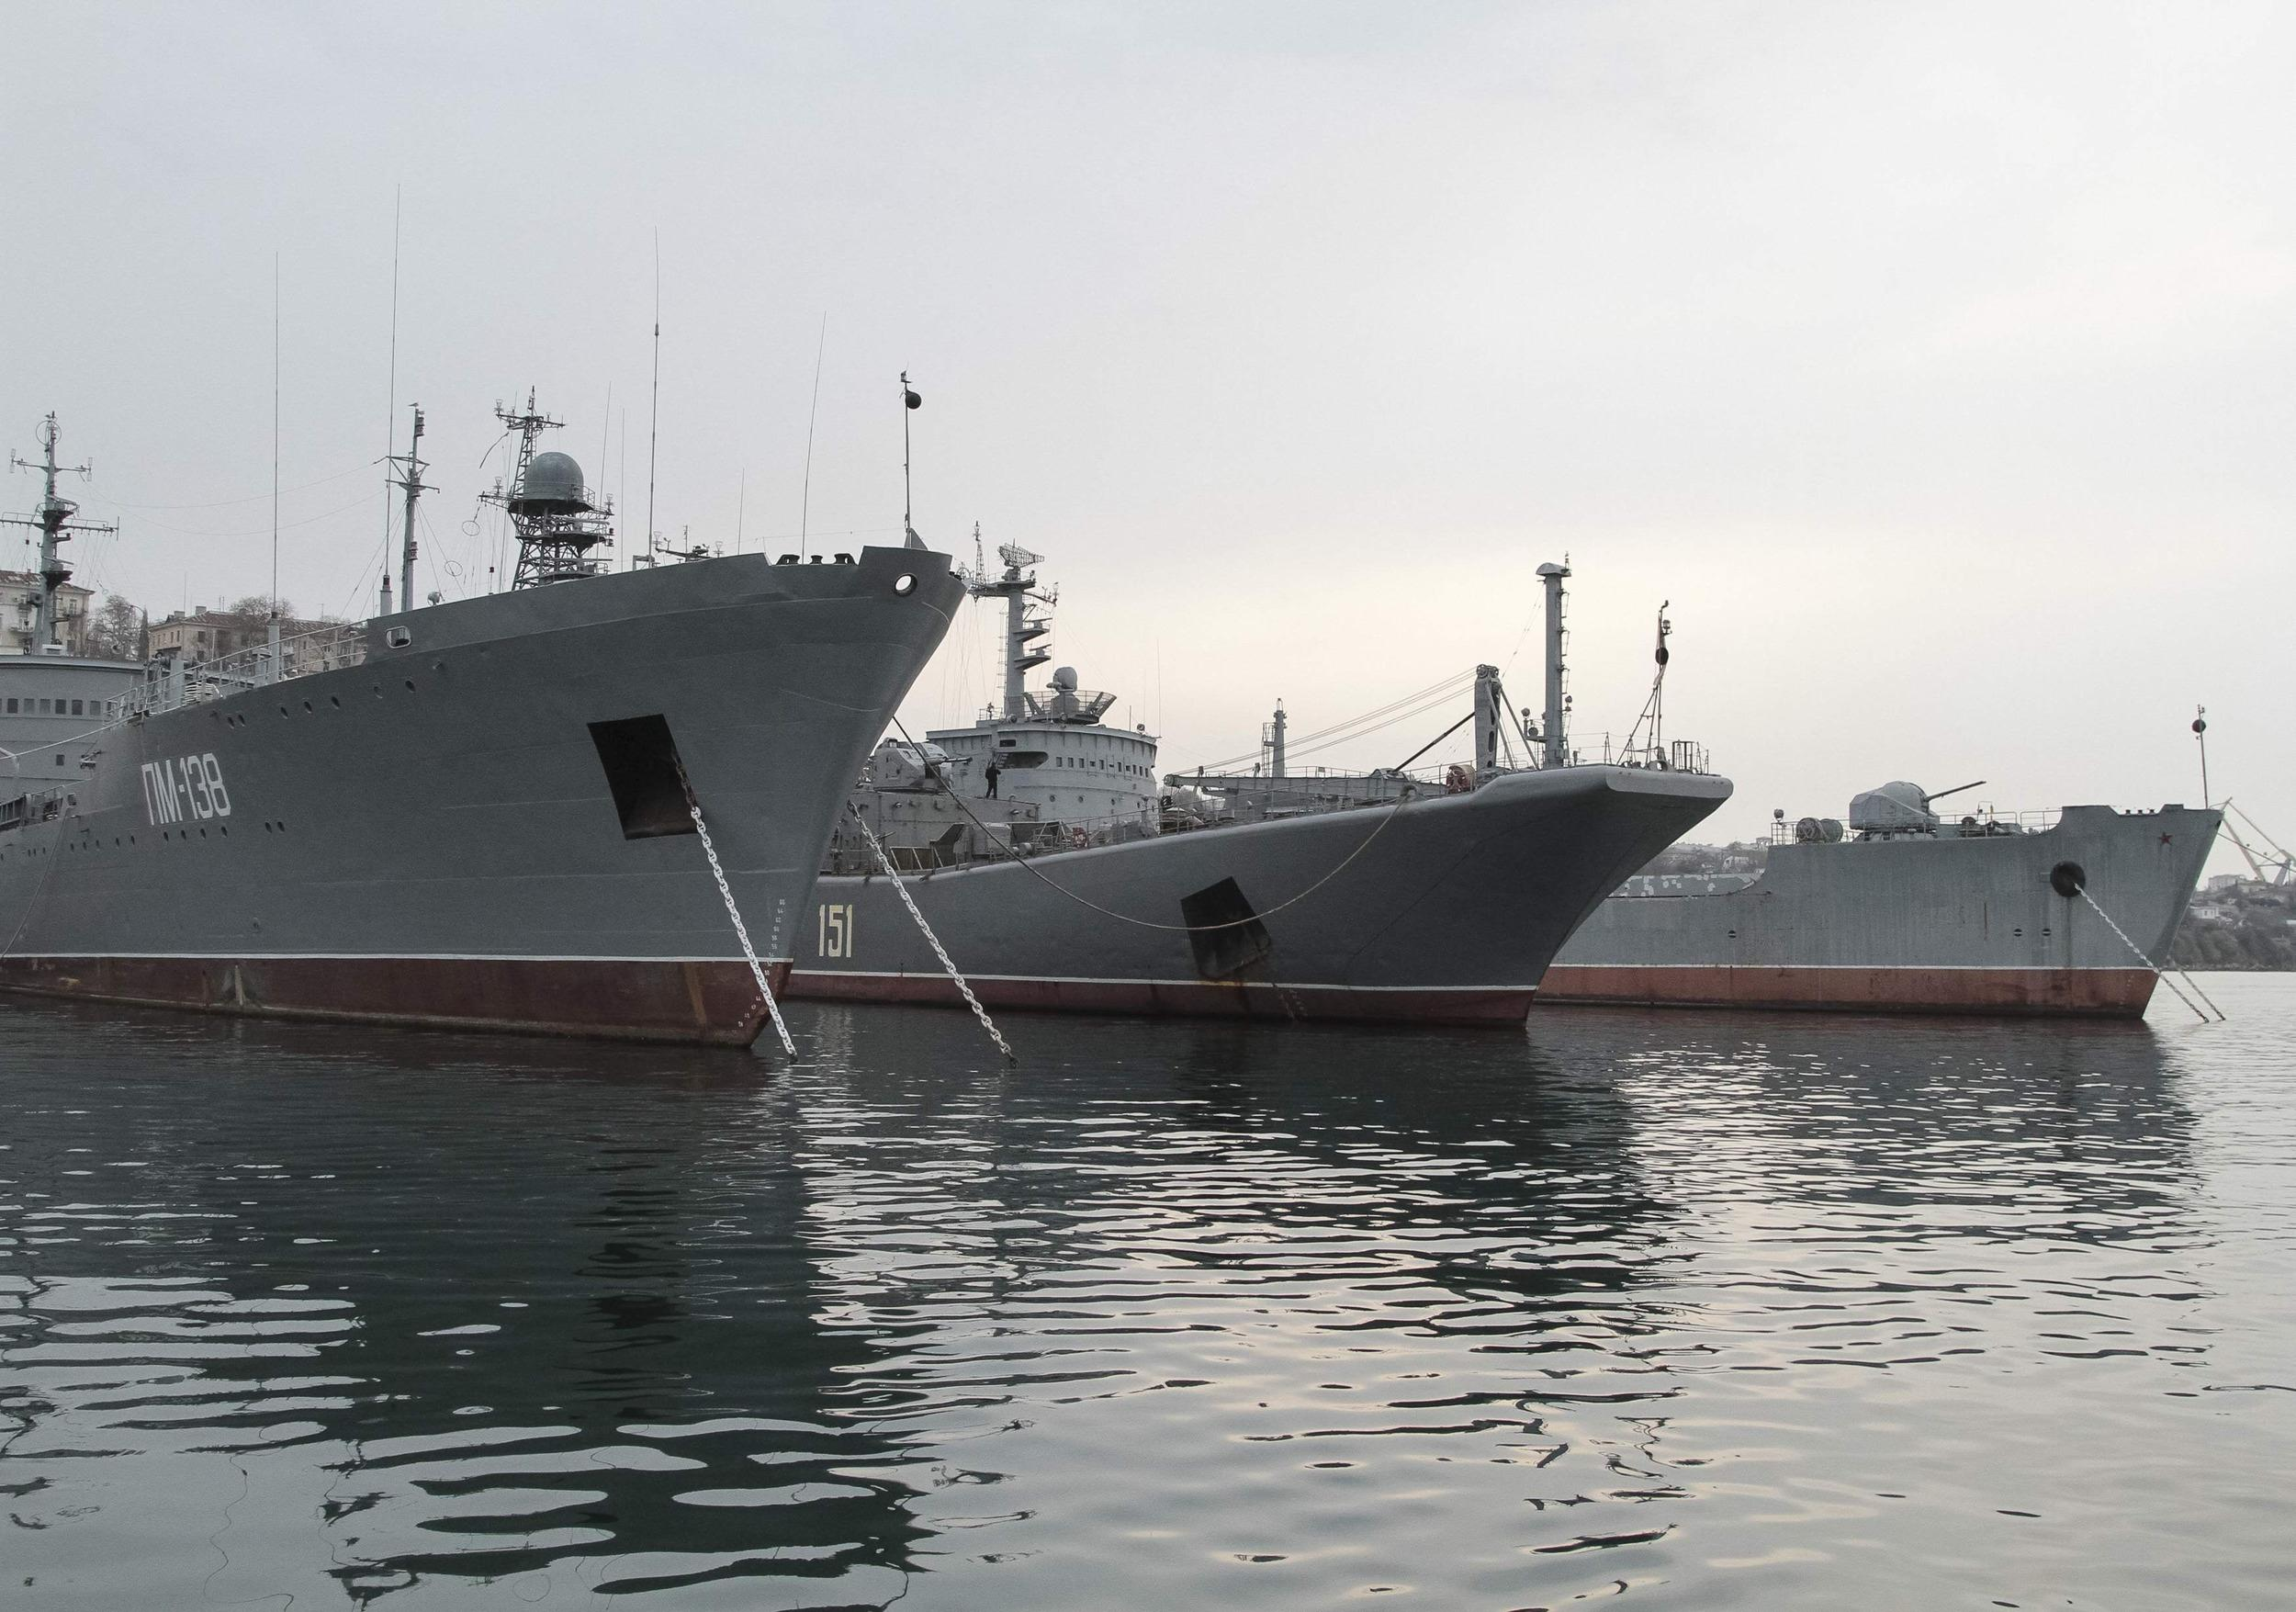 Image: Russian navy ship moored in Sevastopol, Ukaine